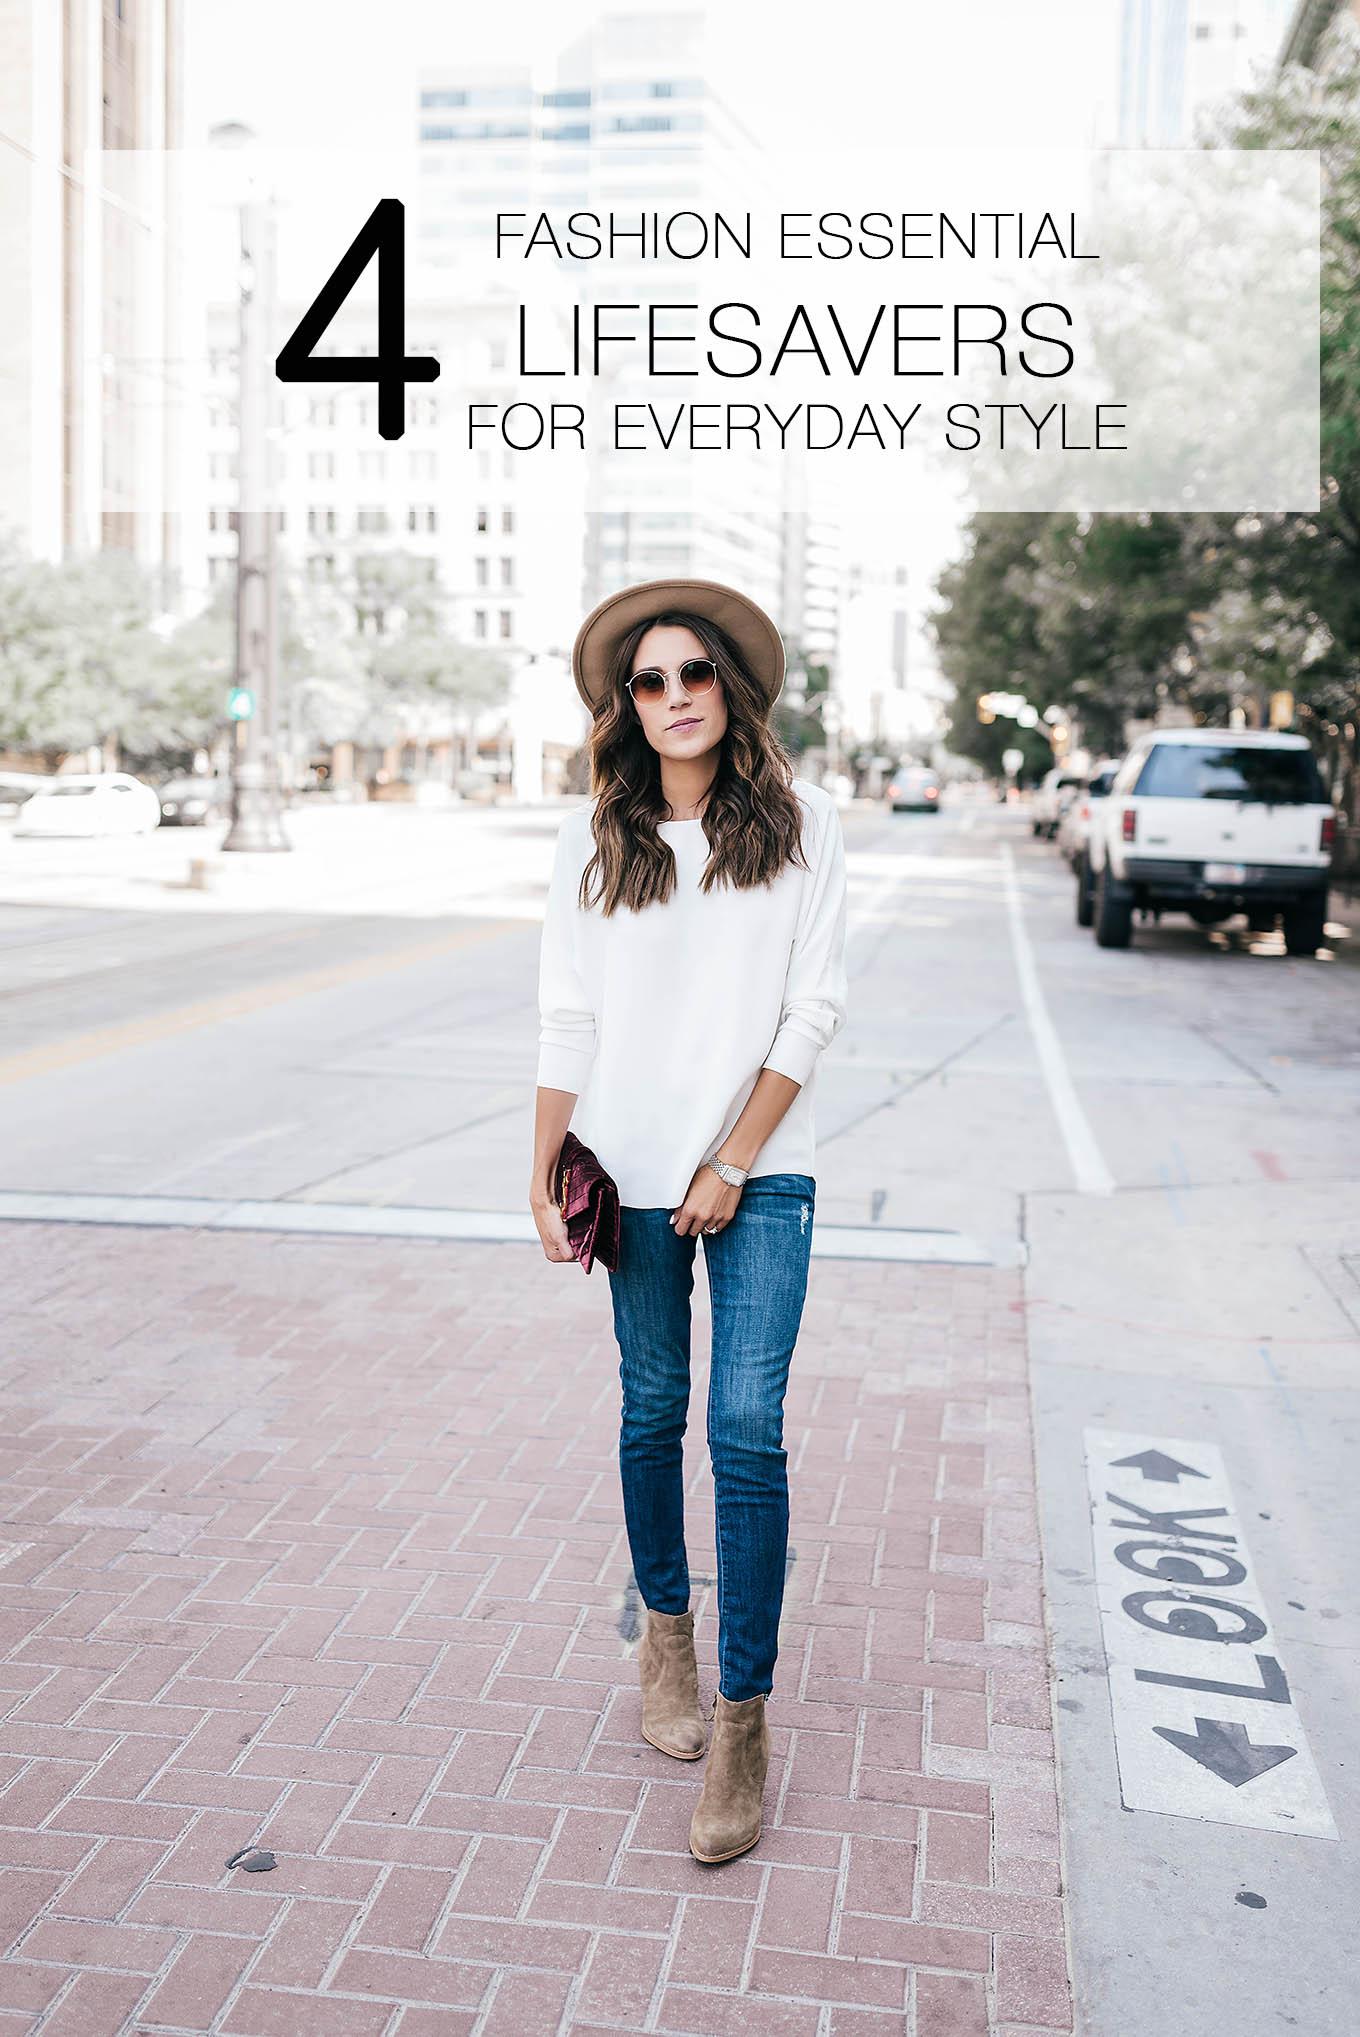 4 fashion lifesavers for everyday style